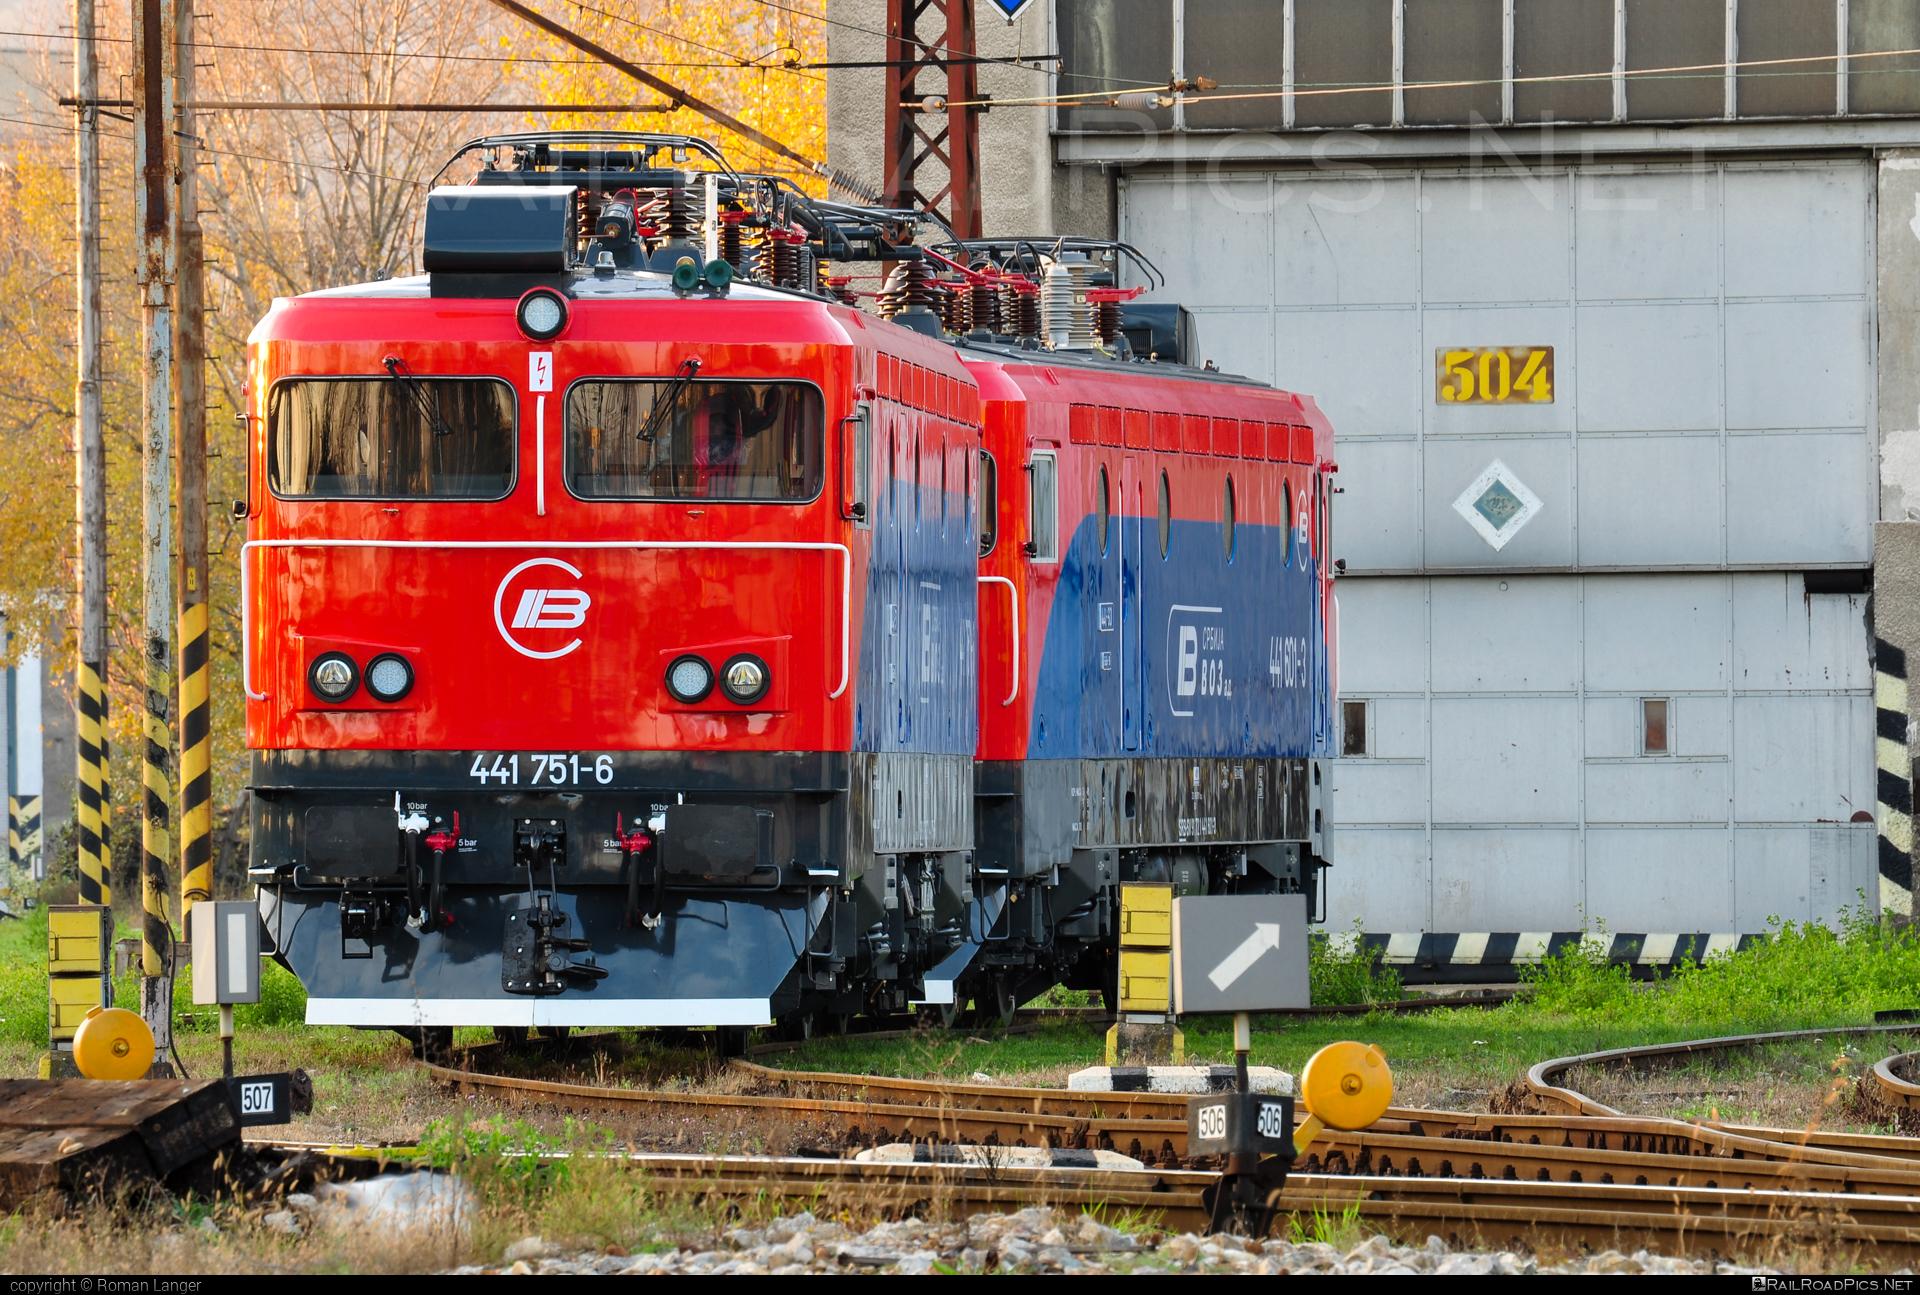 Končar JŽ class 441 - 441 751-6 operated by Srbija voz a.d. #jz441 #koncar #koncar441 #srbijavoz #srbijavozad